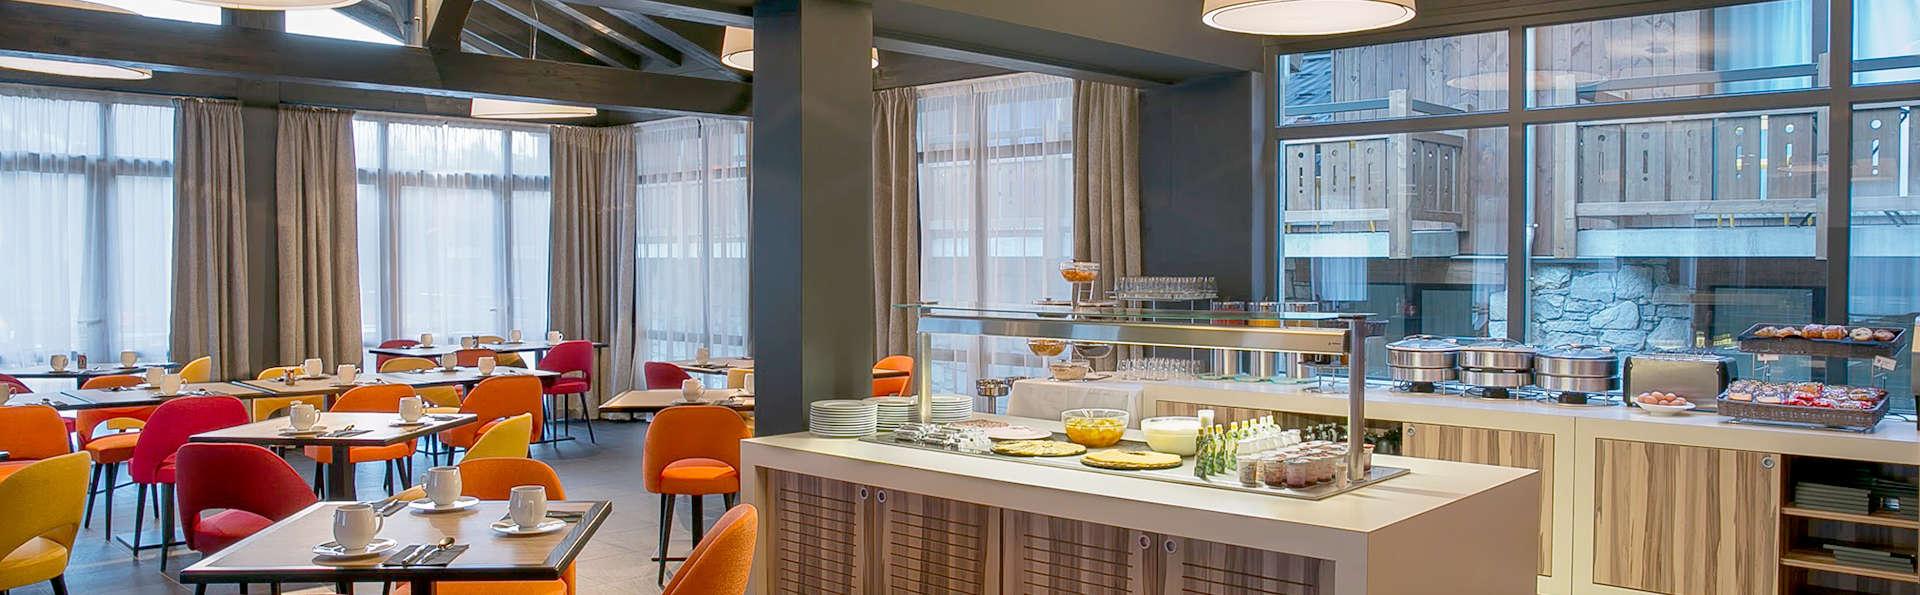 Best Western Plus Excelsior Chamonix Hotel Spa  - Edit_Restaurant.jpg